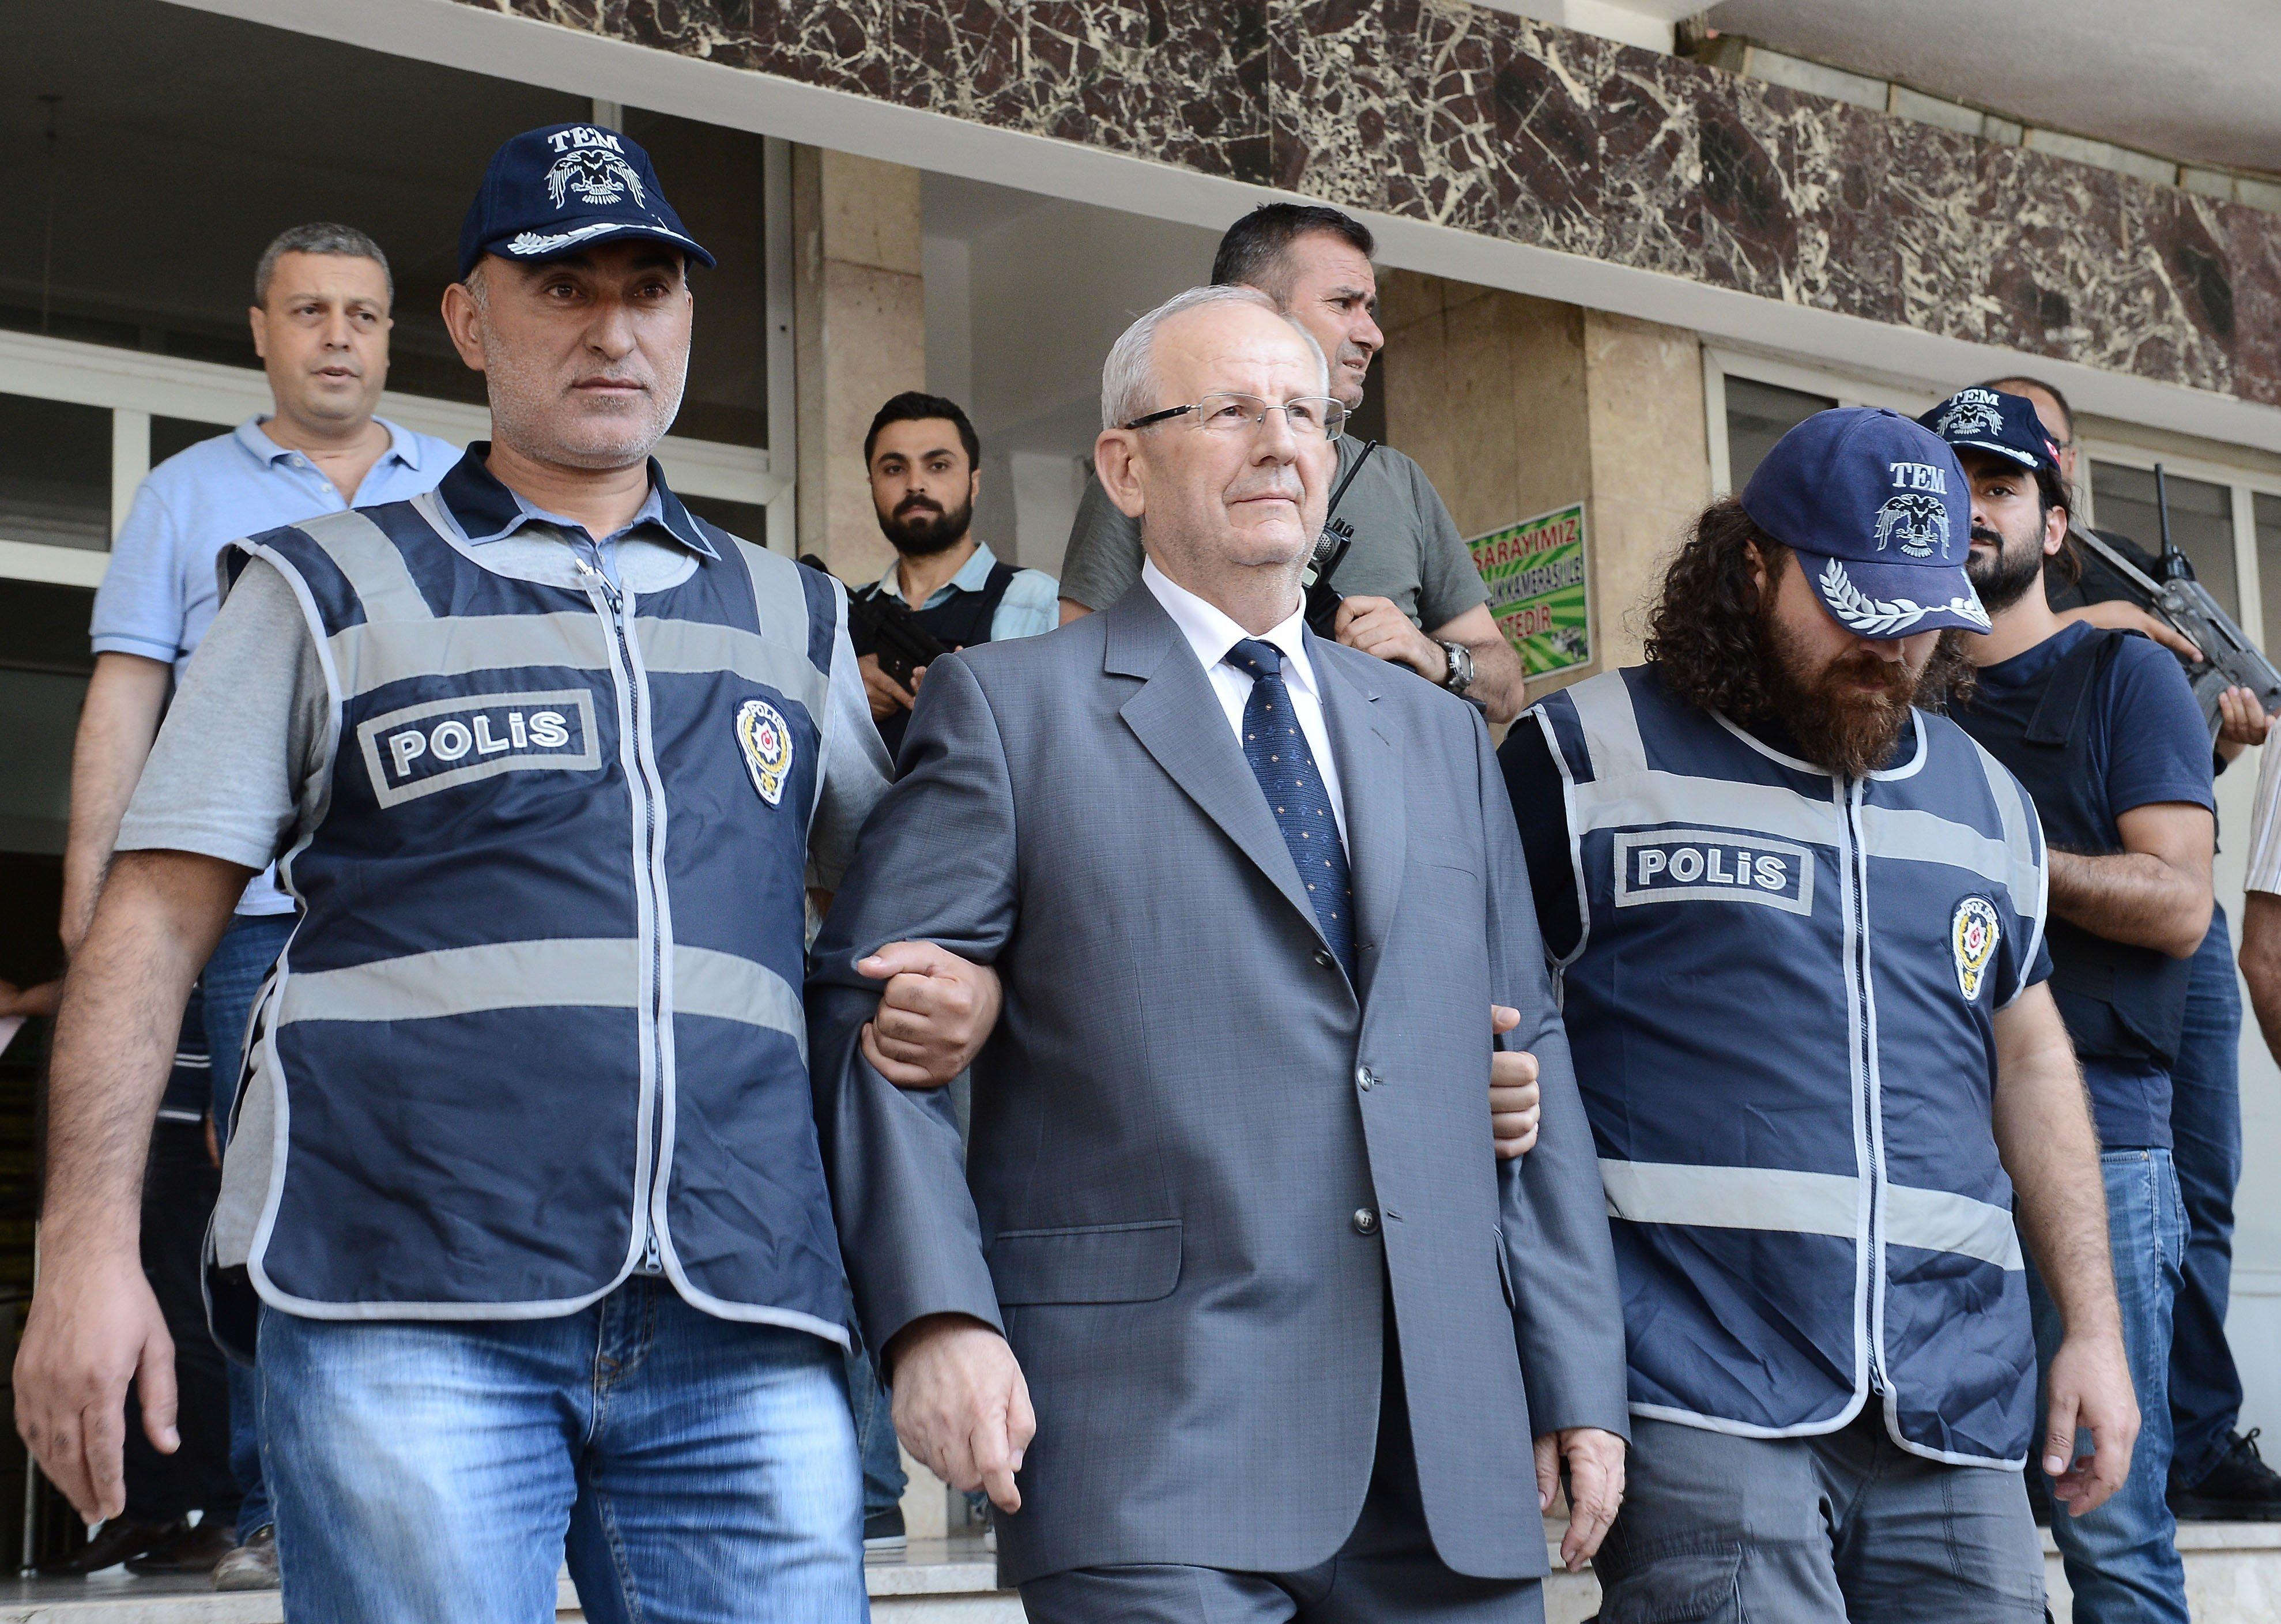 MALATYA, TURKEY - JULY 18: Turkish Second Army Commander General Adem Huduti (C) is arrested following the failed Parallel State/Gulenist Terrorist Organization's military coup attempt, in Malatya, Turkey on July 18, 2016.  (Photo by Volkan Kasik/Anadolu Agency/Getty Images)